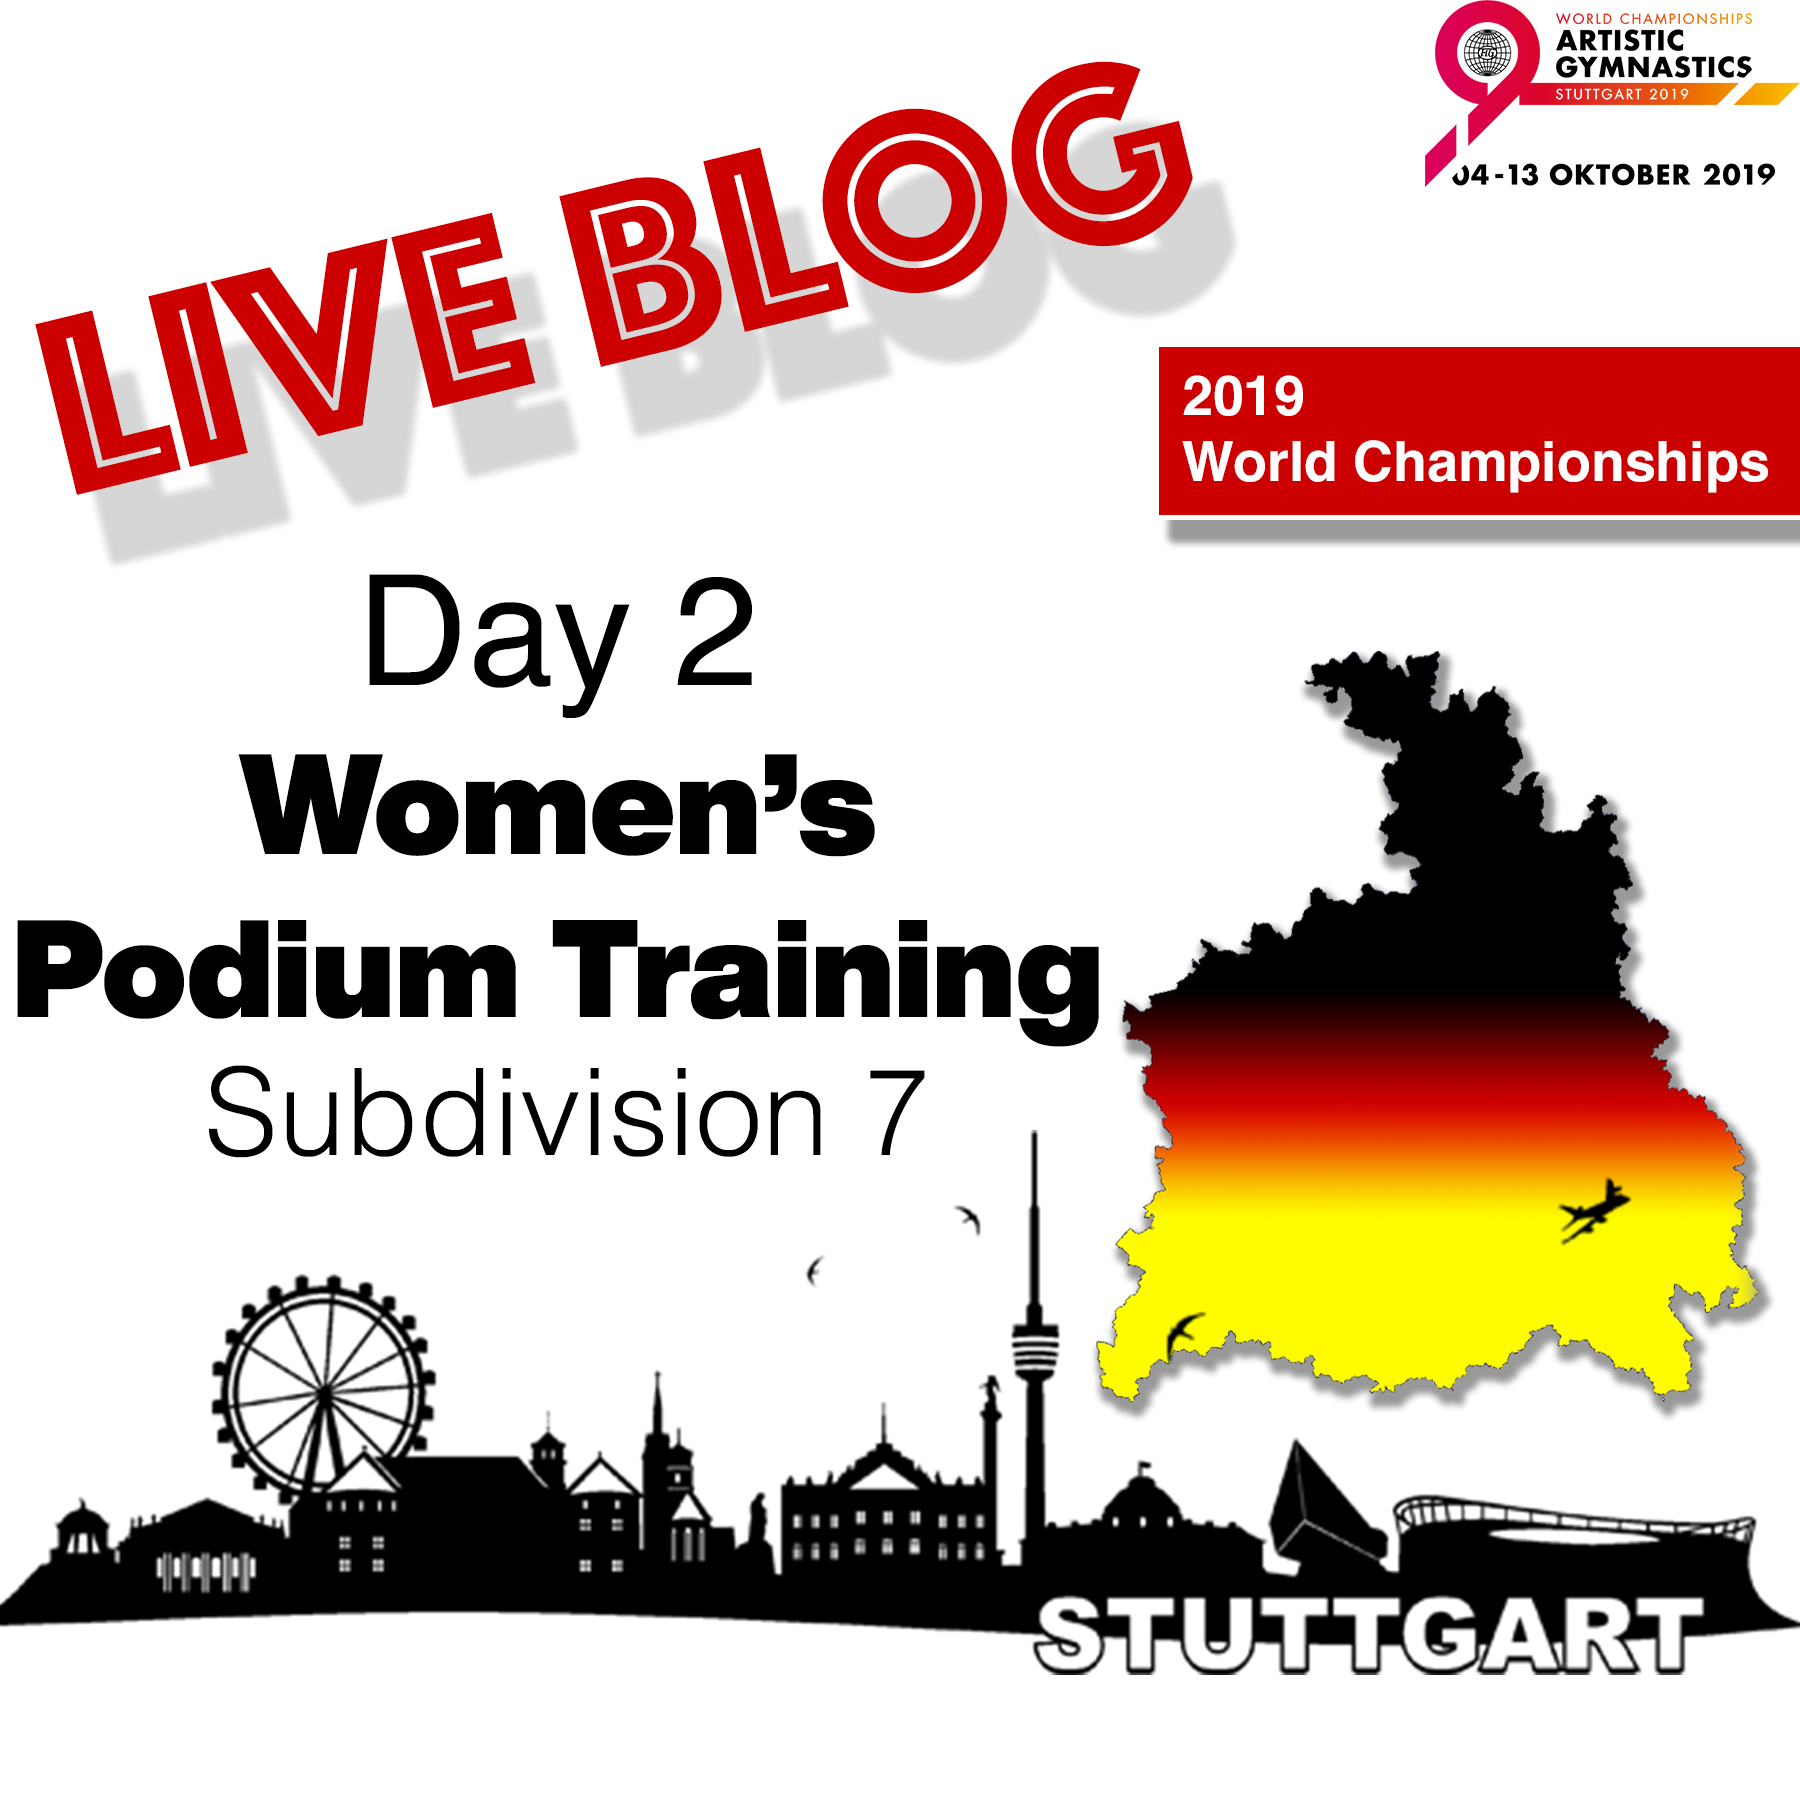 Live Blog: 2019 World Championships – WAG Podium Training – Sub Division 7, Oct. 1st